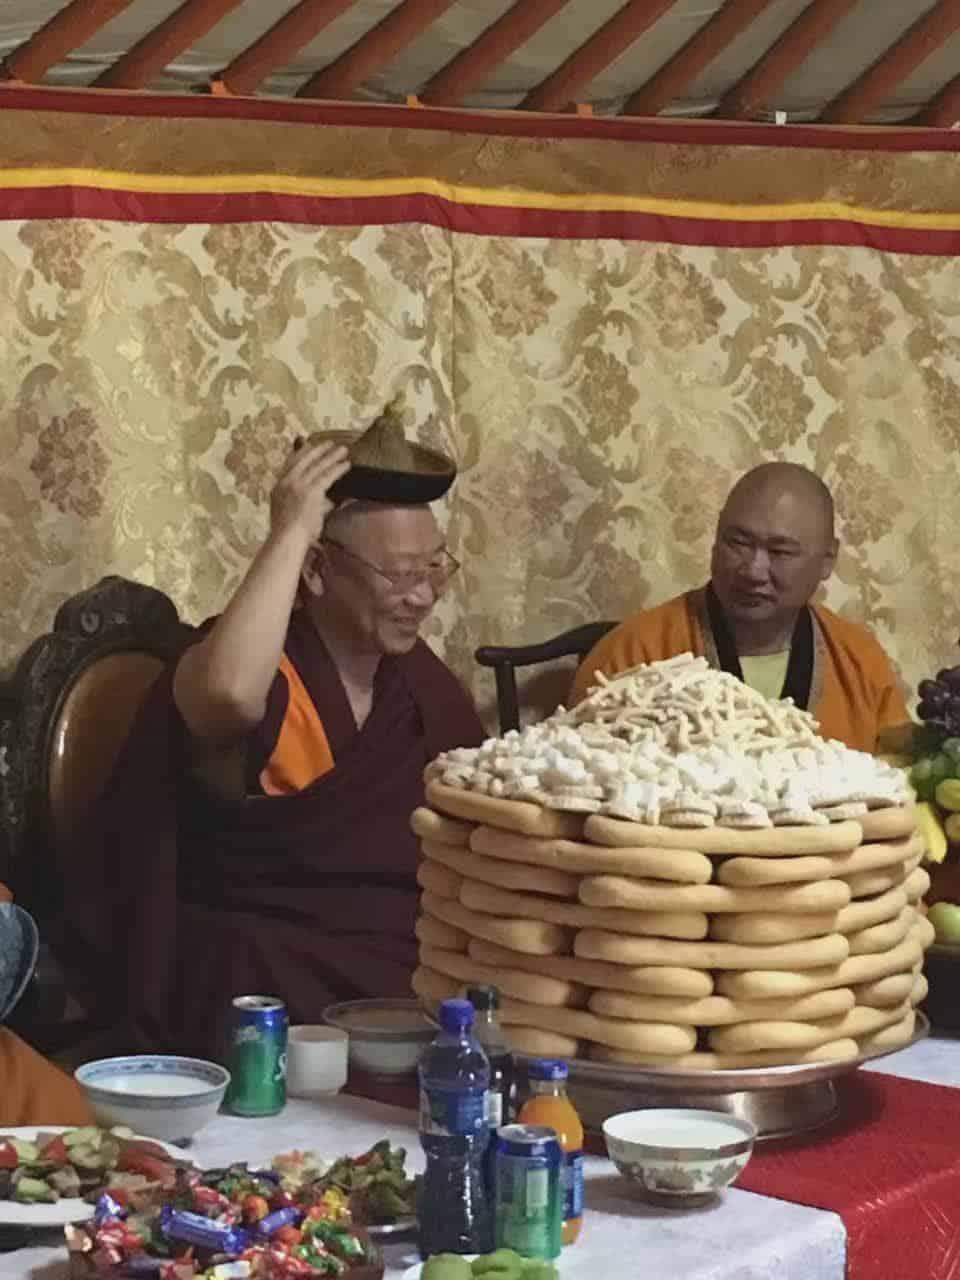 gosok-rinpoche-mongolia-2016-5d10a4d716c22c7de7c1d4c6a5a0c77